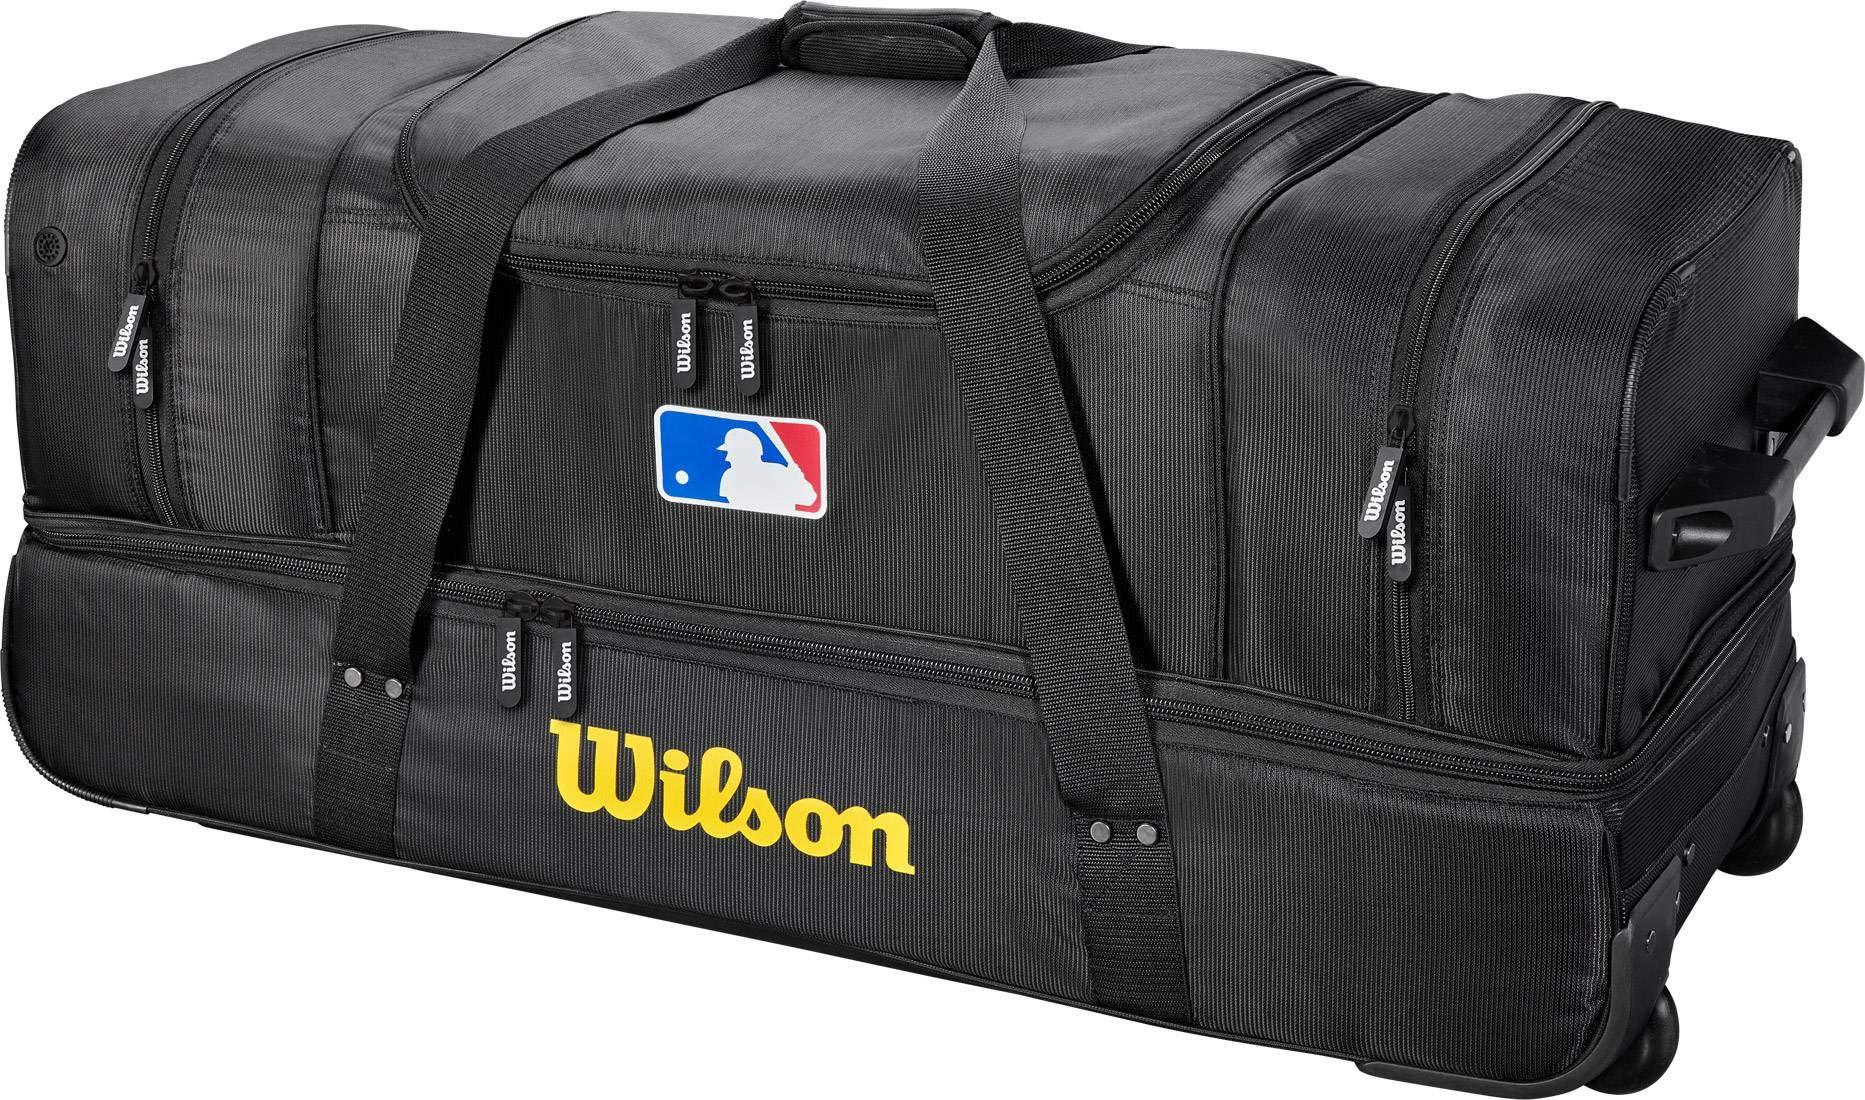 Wilson Sporting Goods Umpire Bag, Black